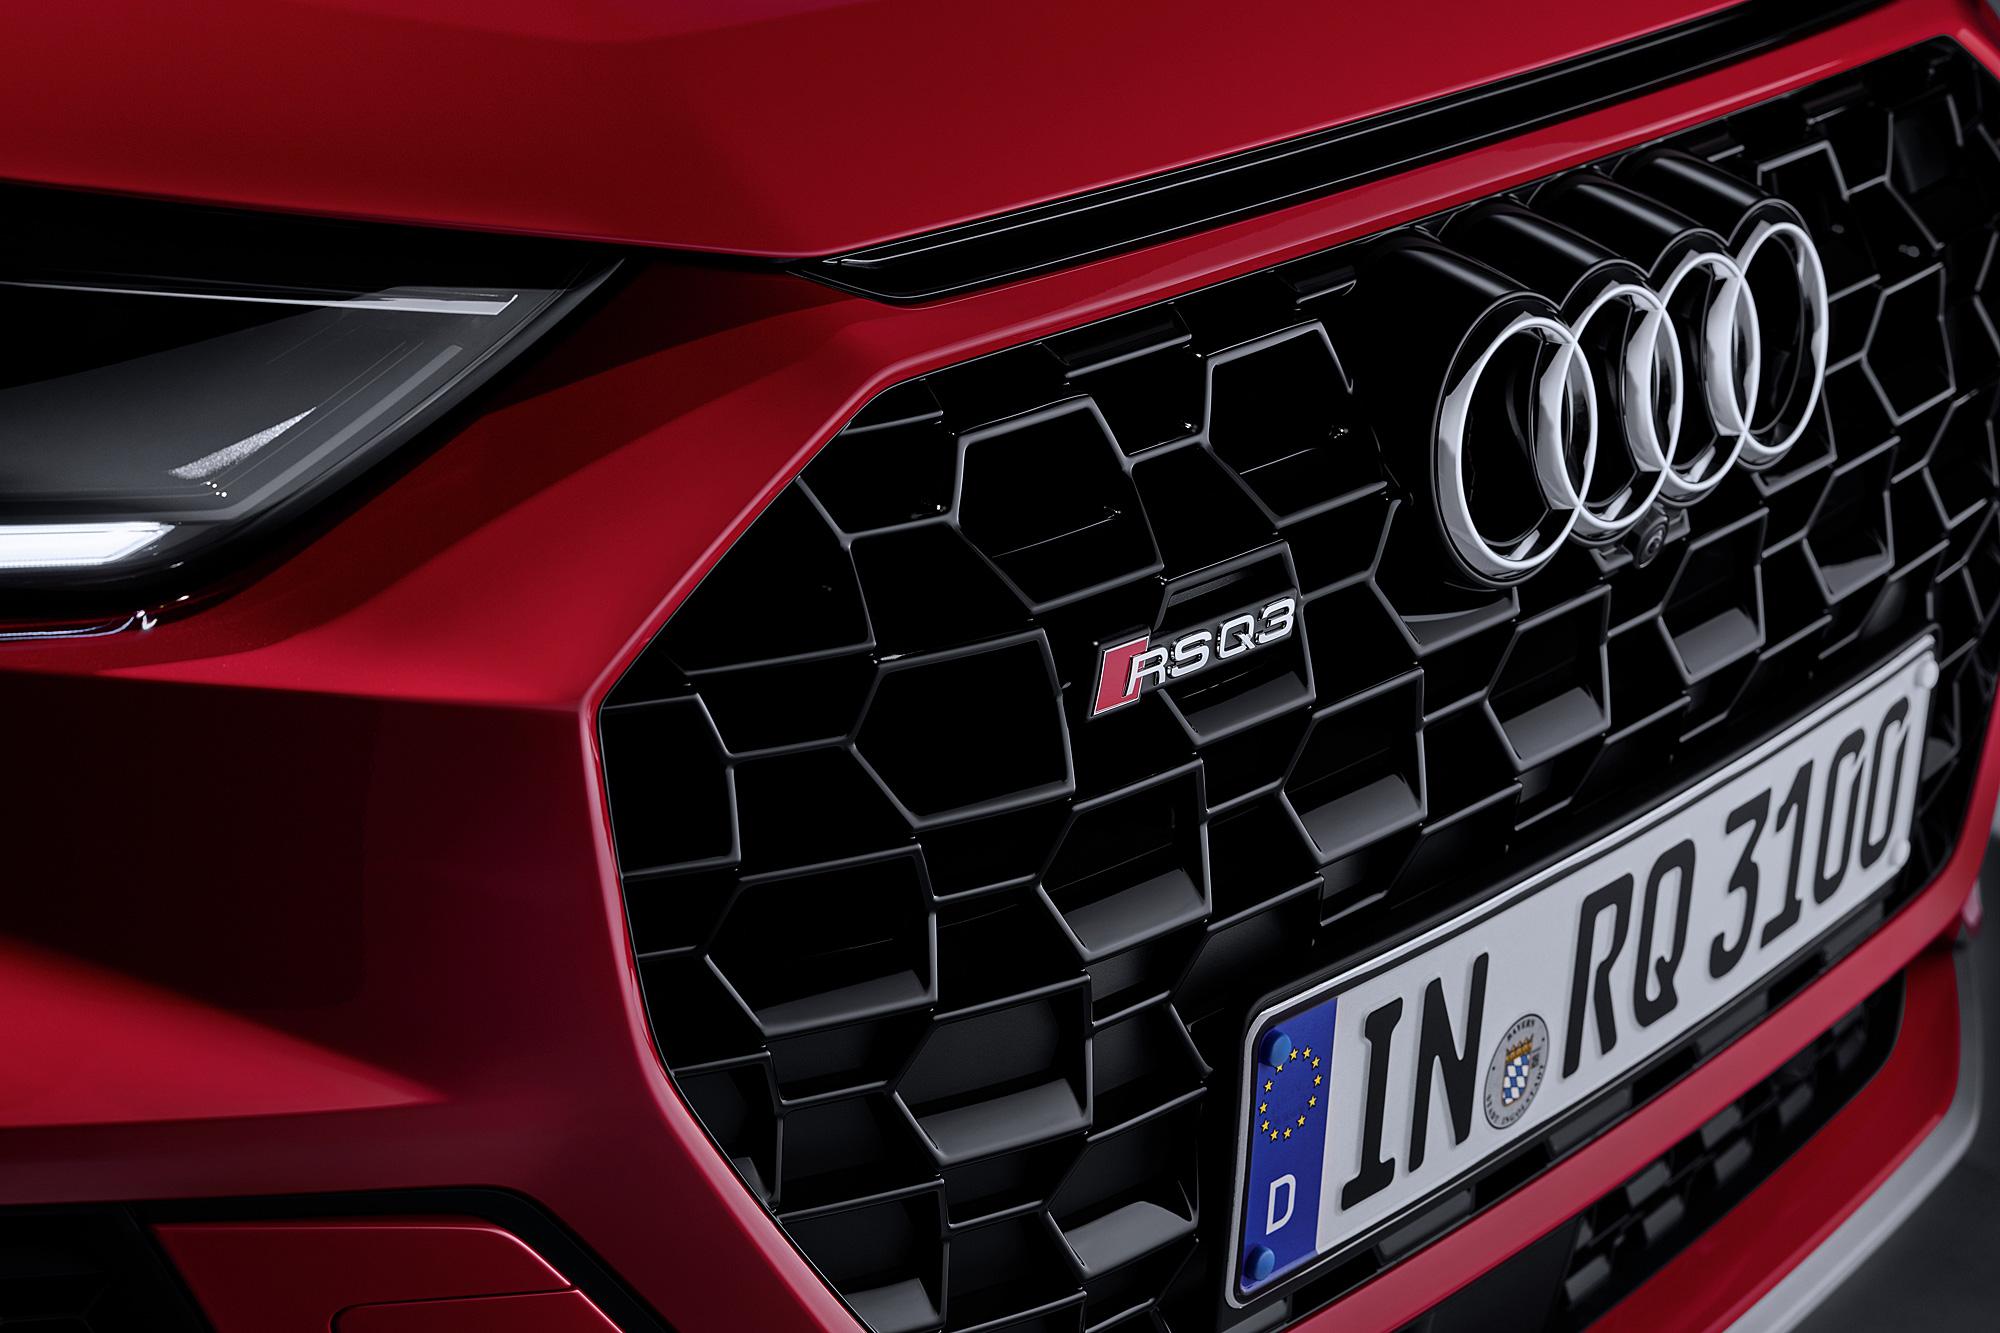 IAA 法蘭克福車展才剛發表 RS 6 Avant 與 RS 7 Sportback , RS Q3 以及 RS Q3 Sportback 隨後報到